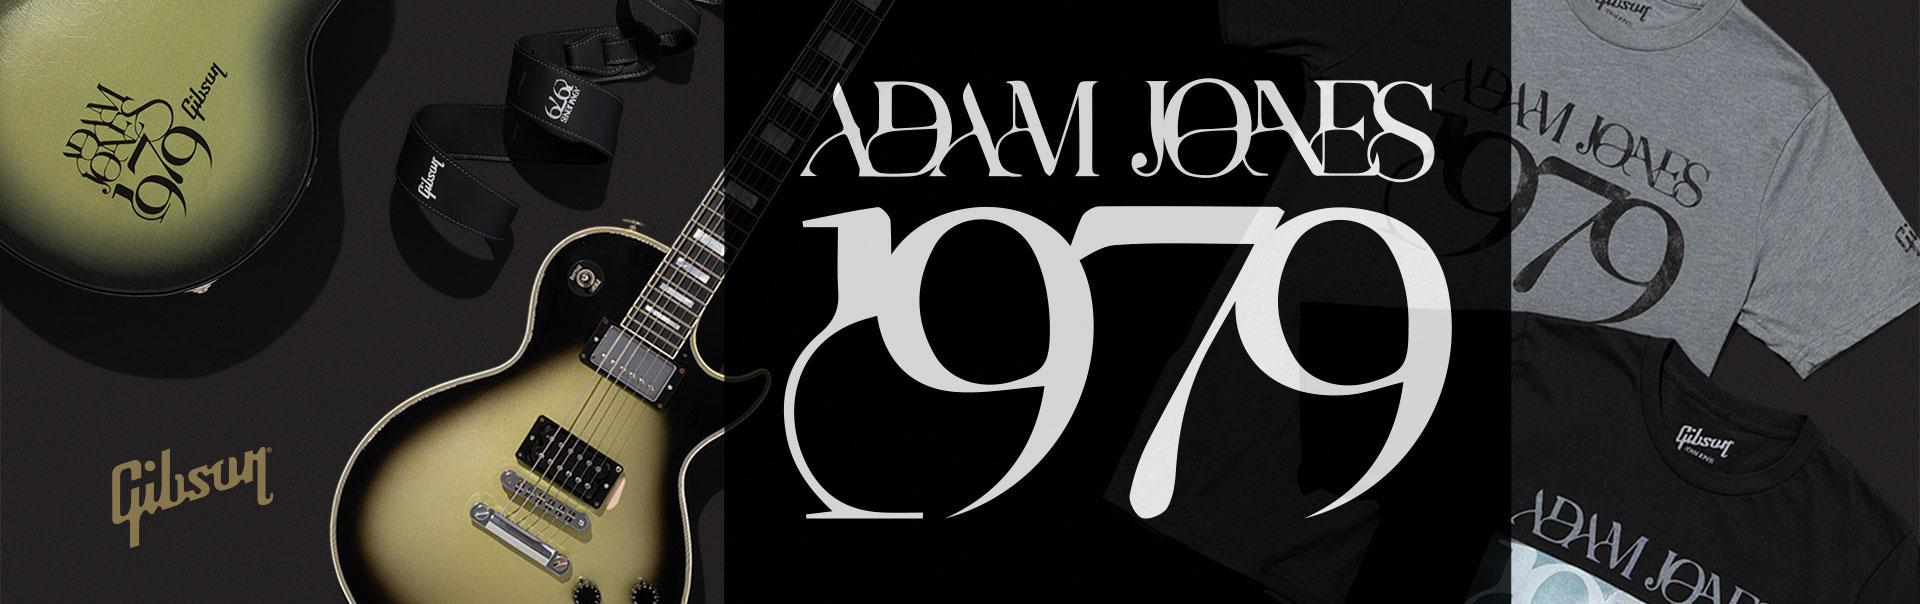 Adam Jones Apparel Collection